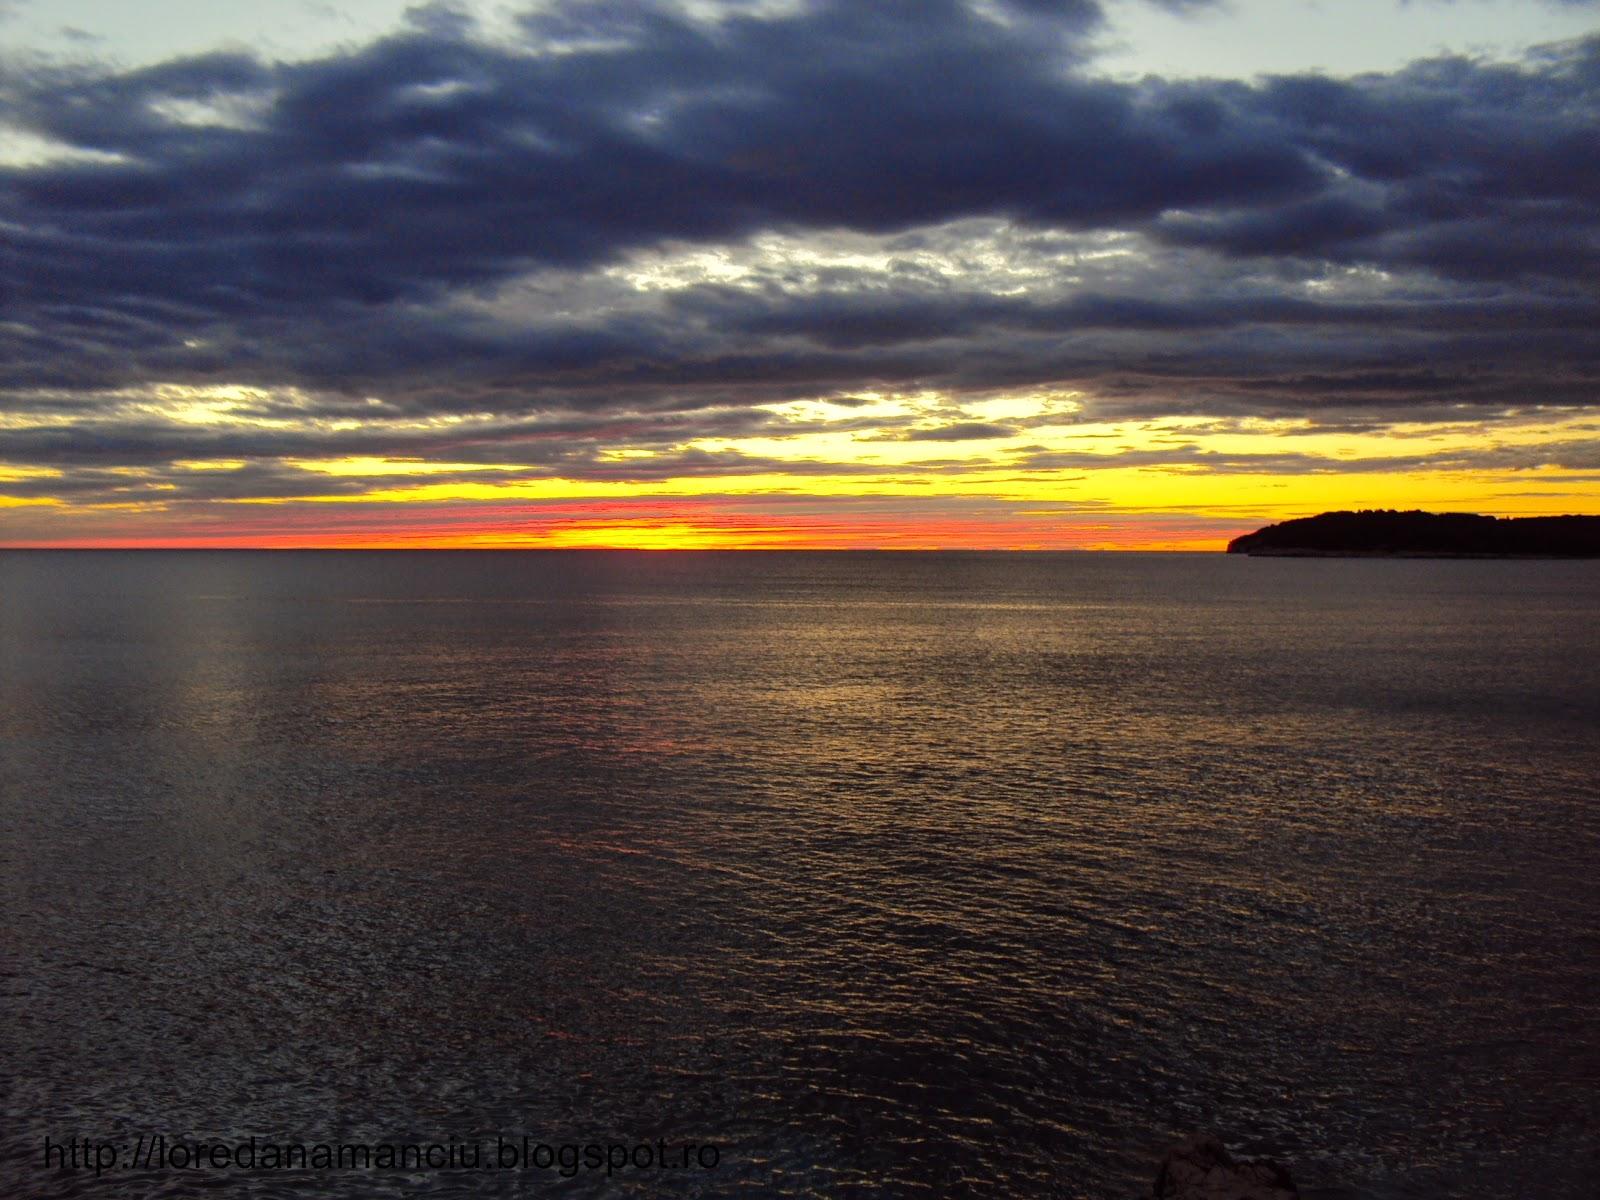 amazing sunset in Croatia, Pola